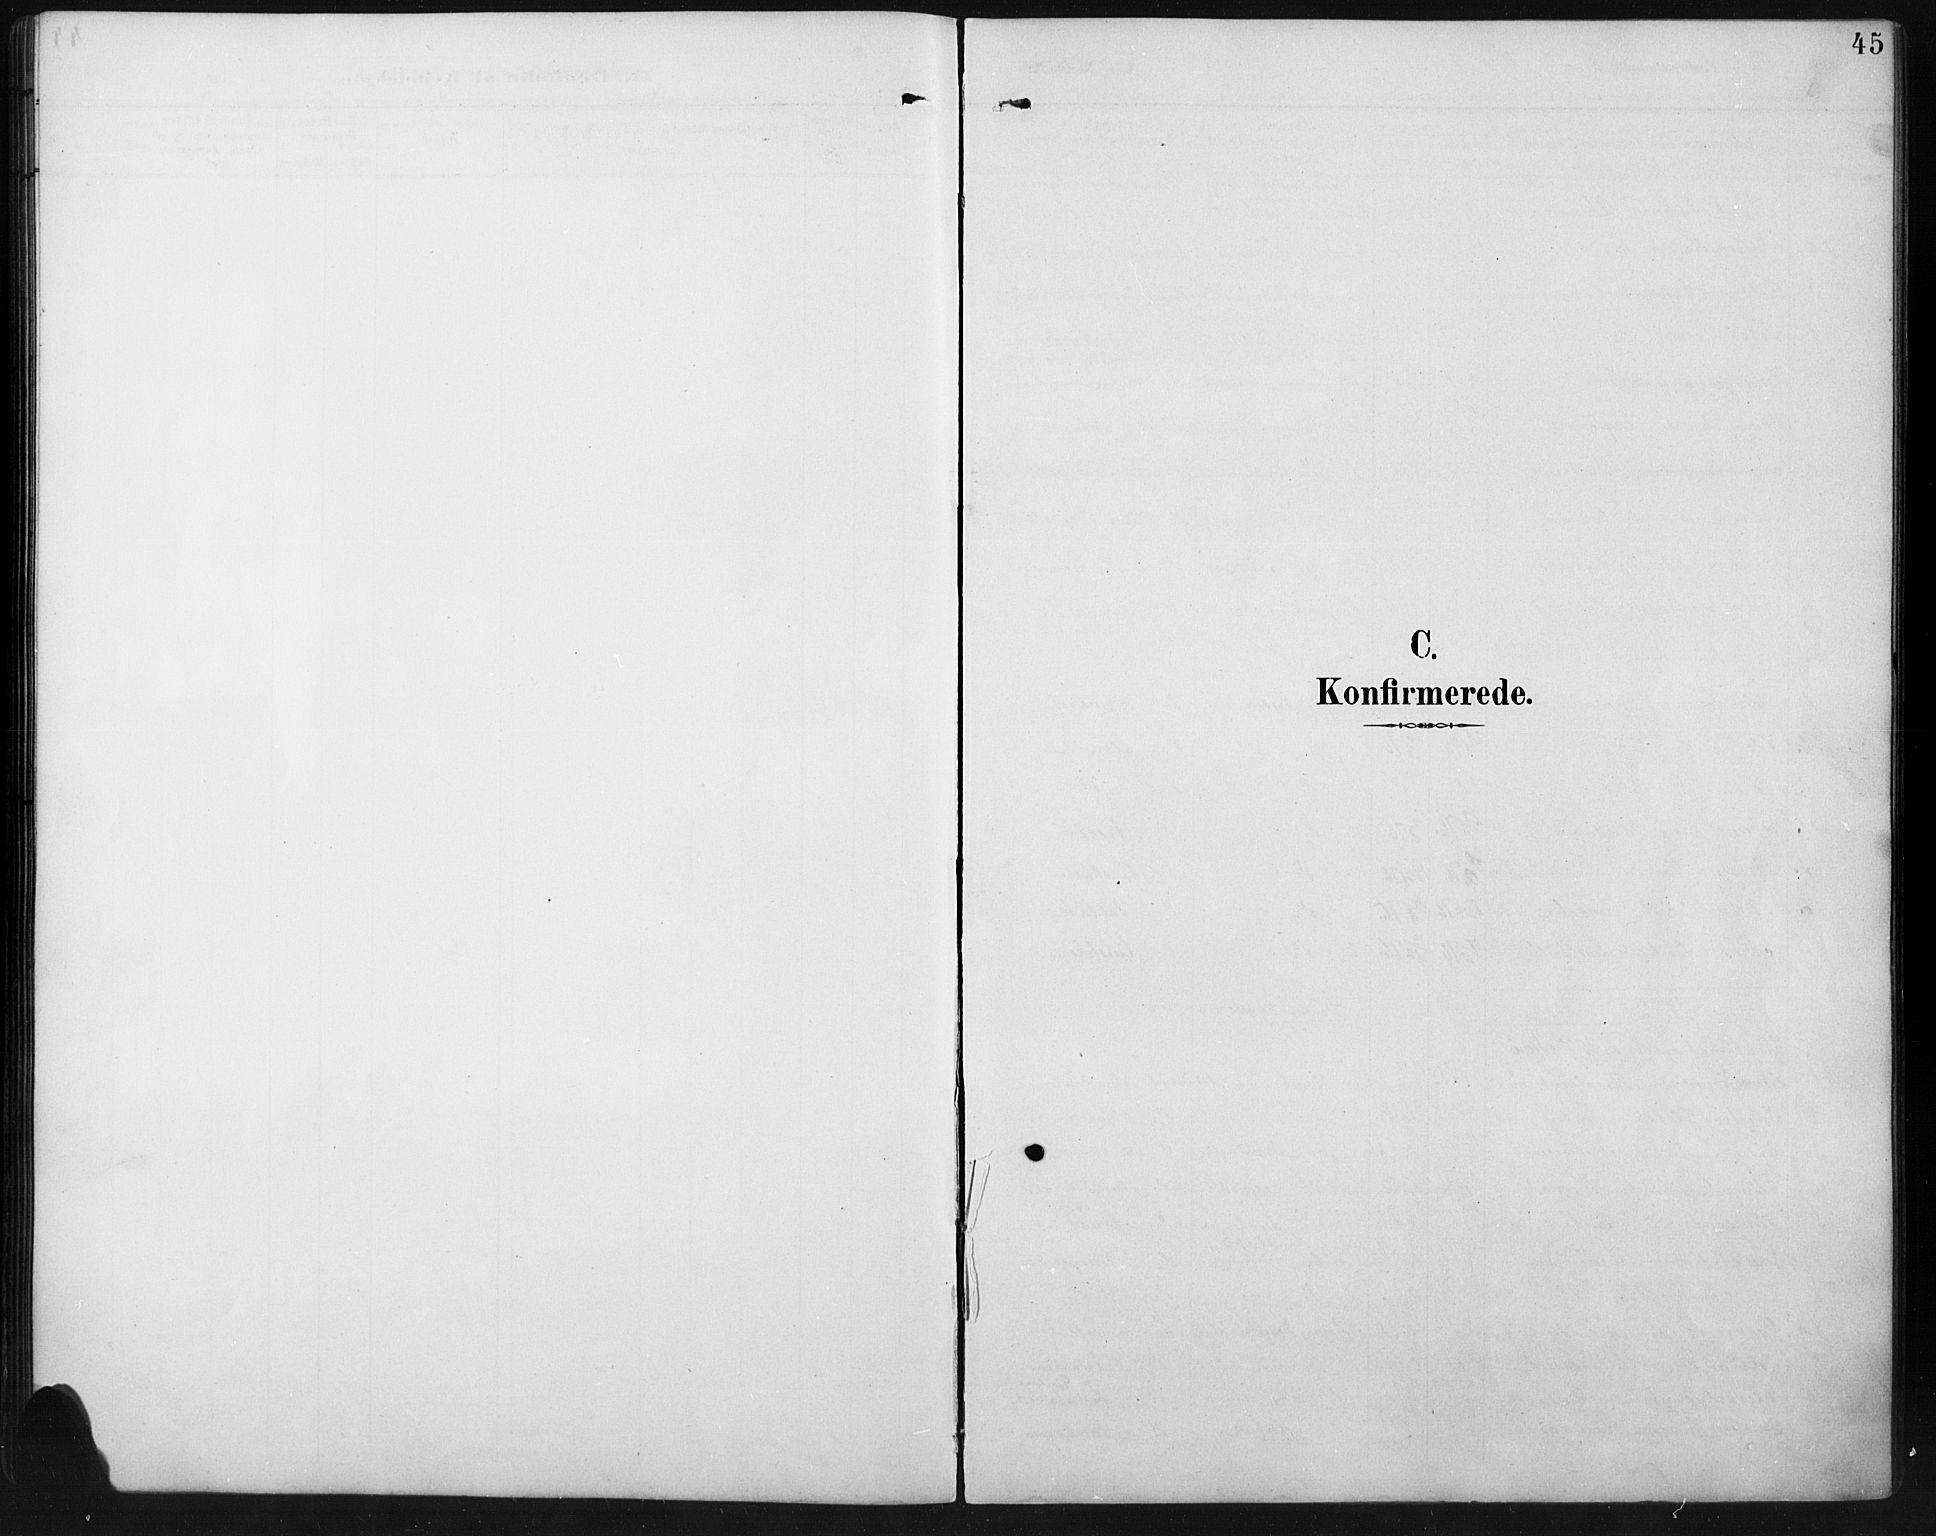 SAH, Ringebu prestekontor, Klokkerbok nr. 8, 1890-1922, s. 45